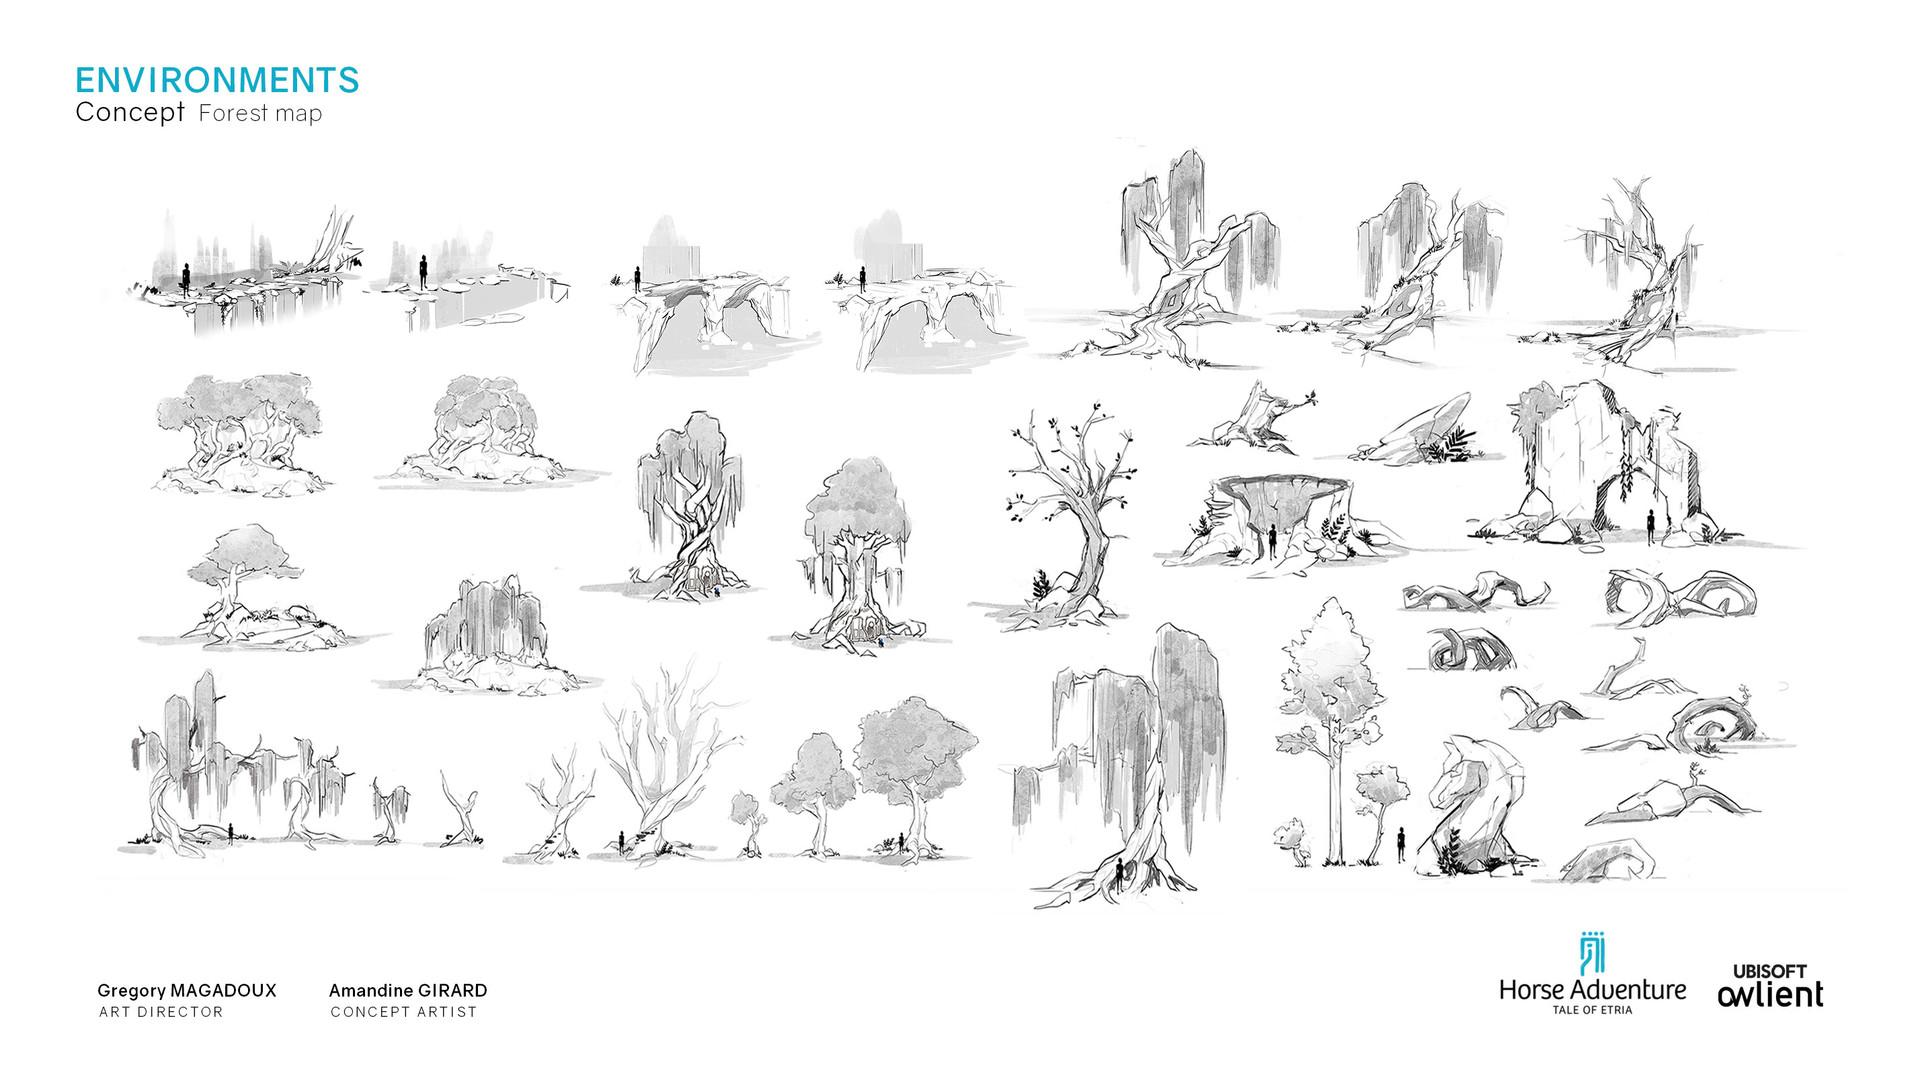 Koni amandine girard amandine girard koni horseadventure forest 02